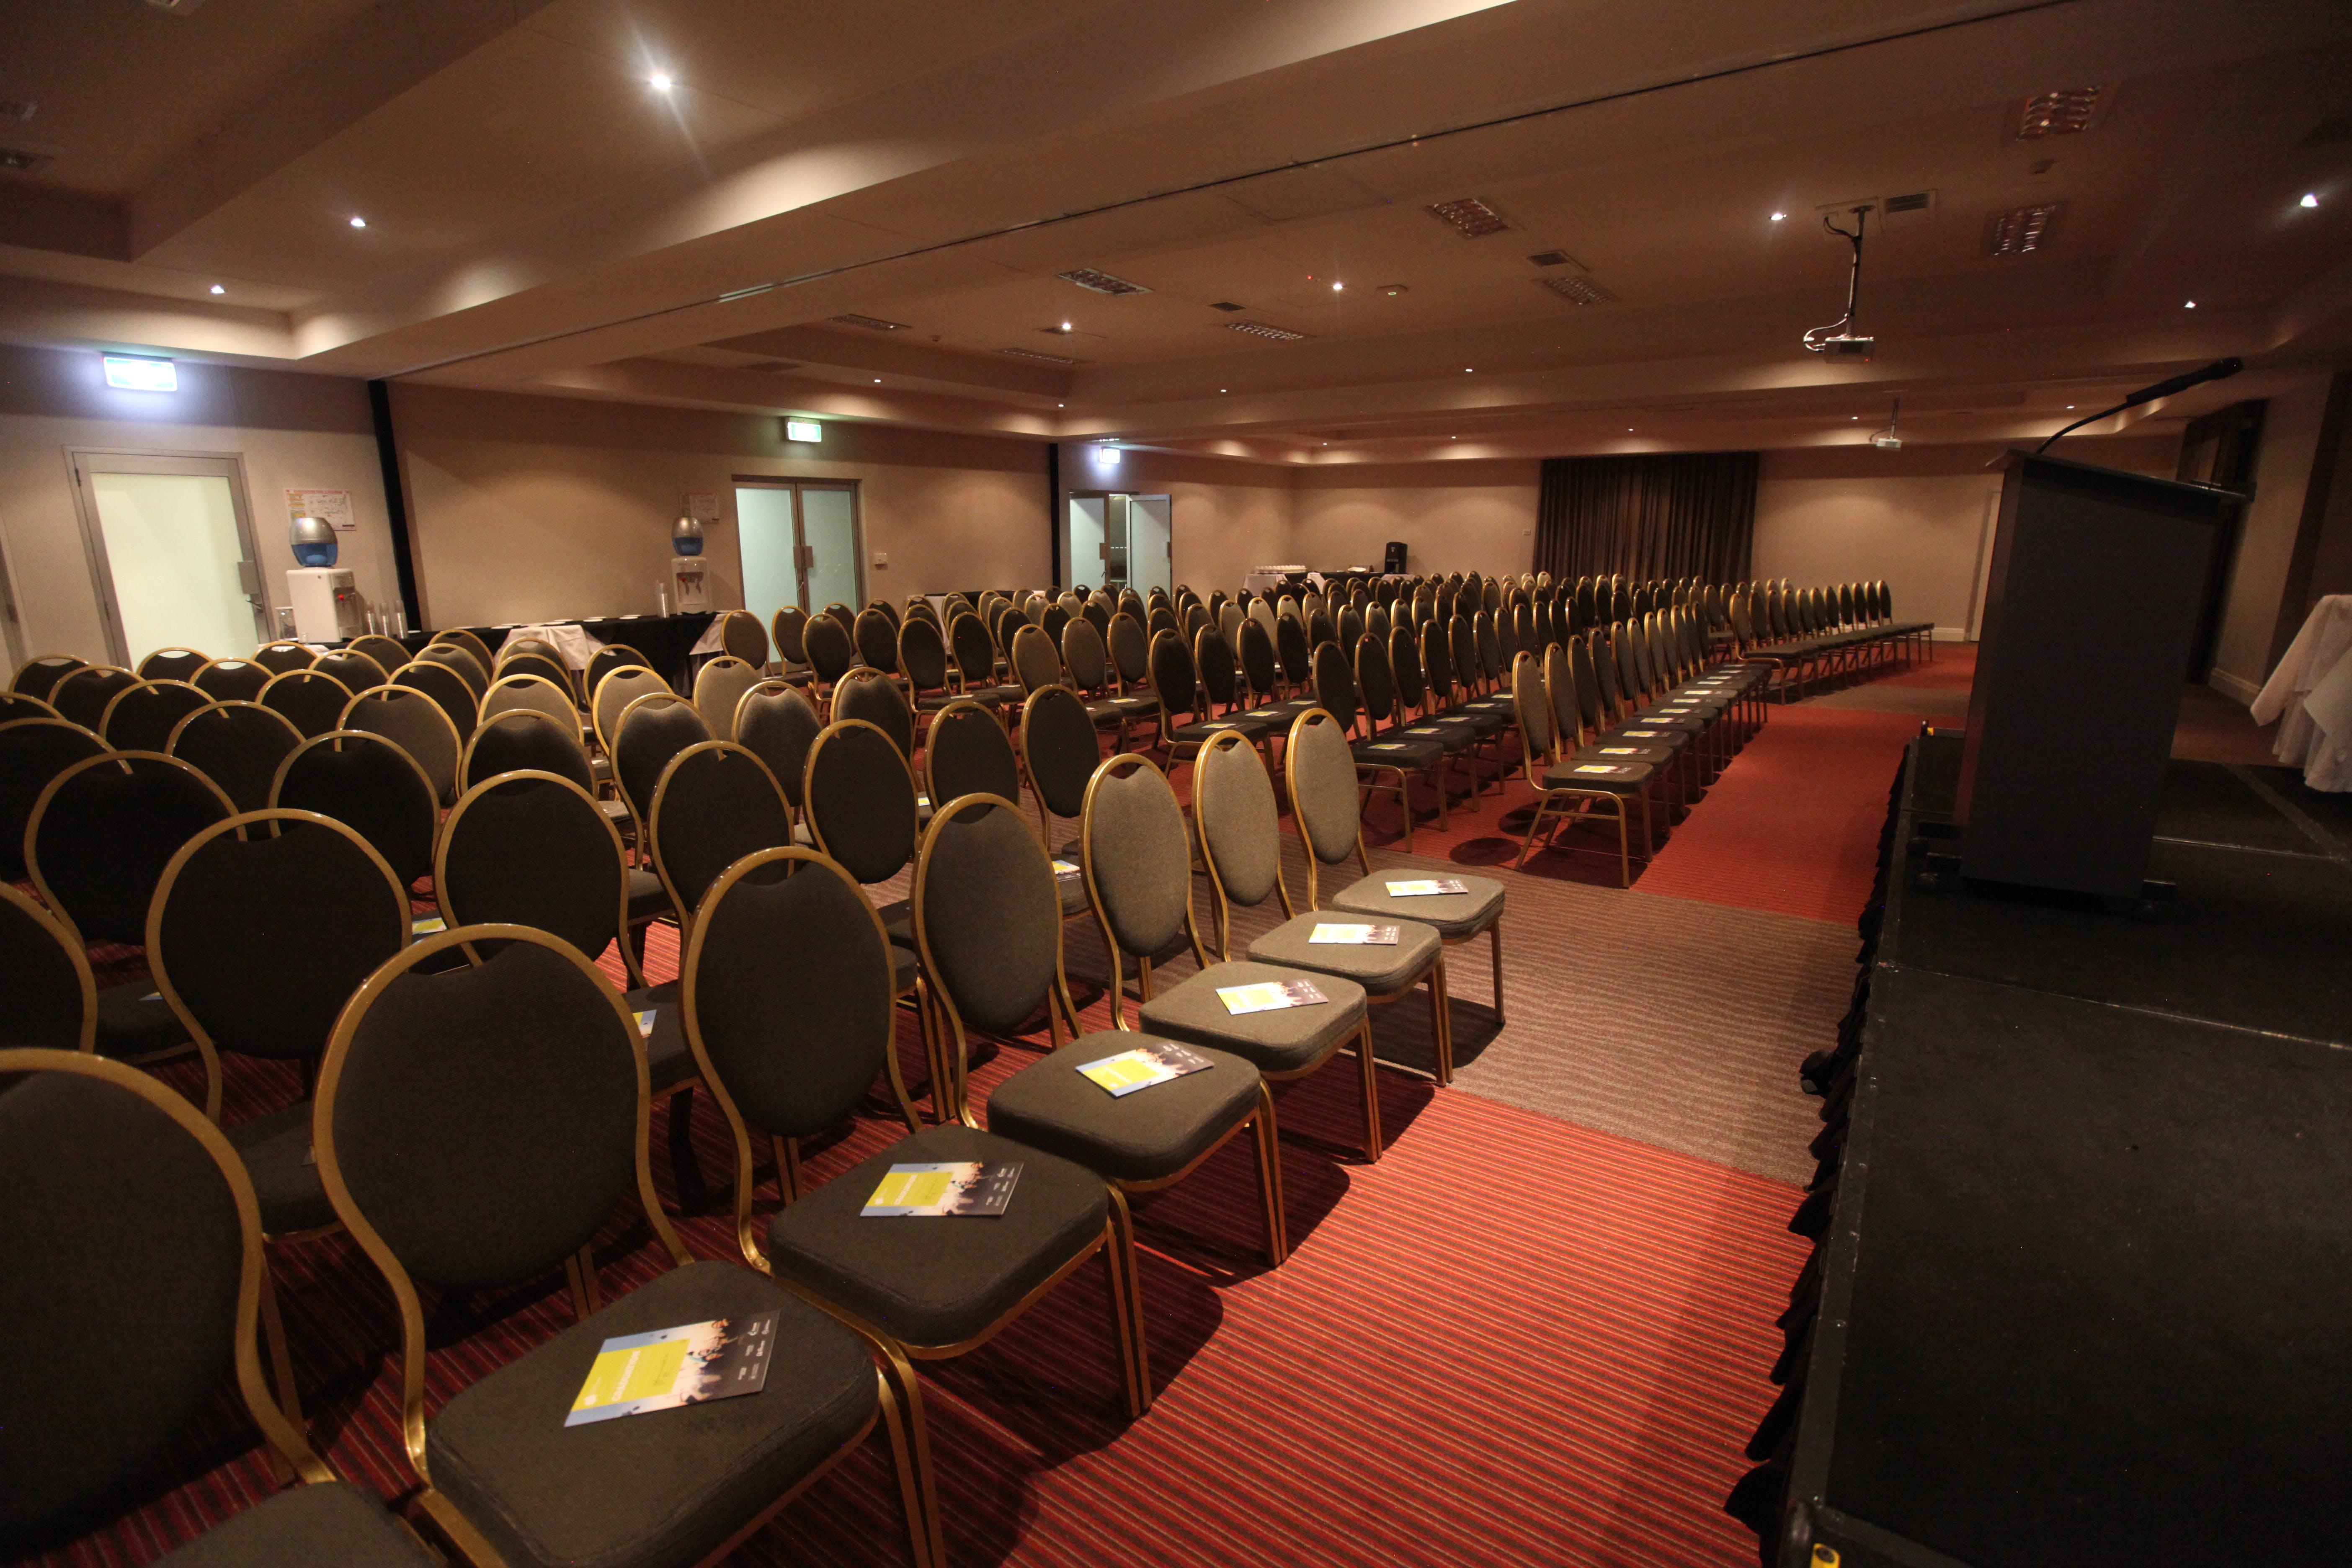 Grandchester Ballroom, meeting room at Metro Hotel Ipswich International, image 1